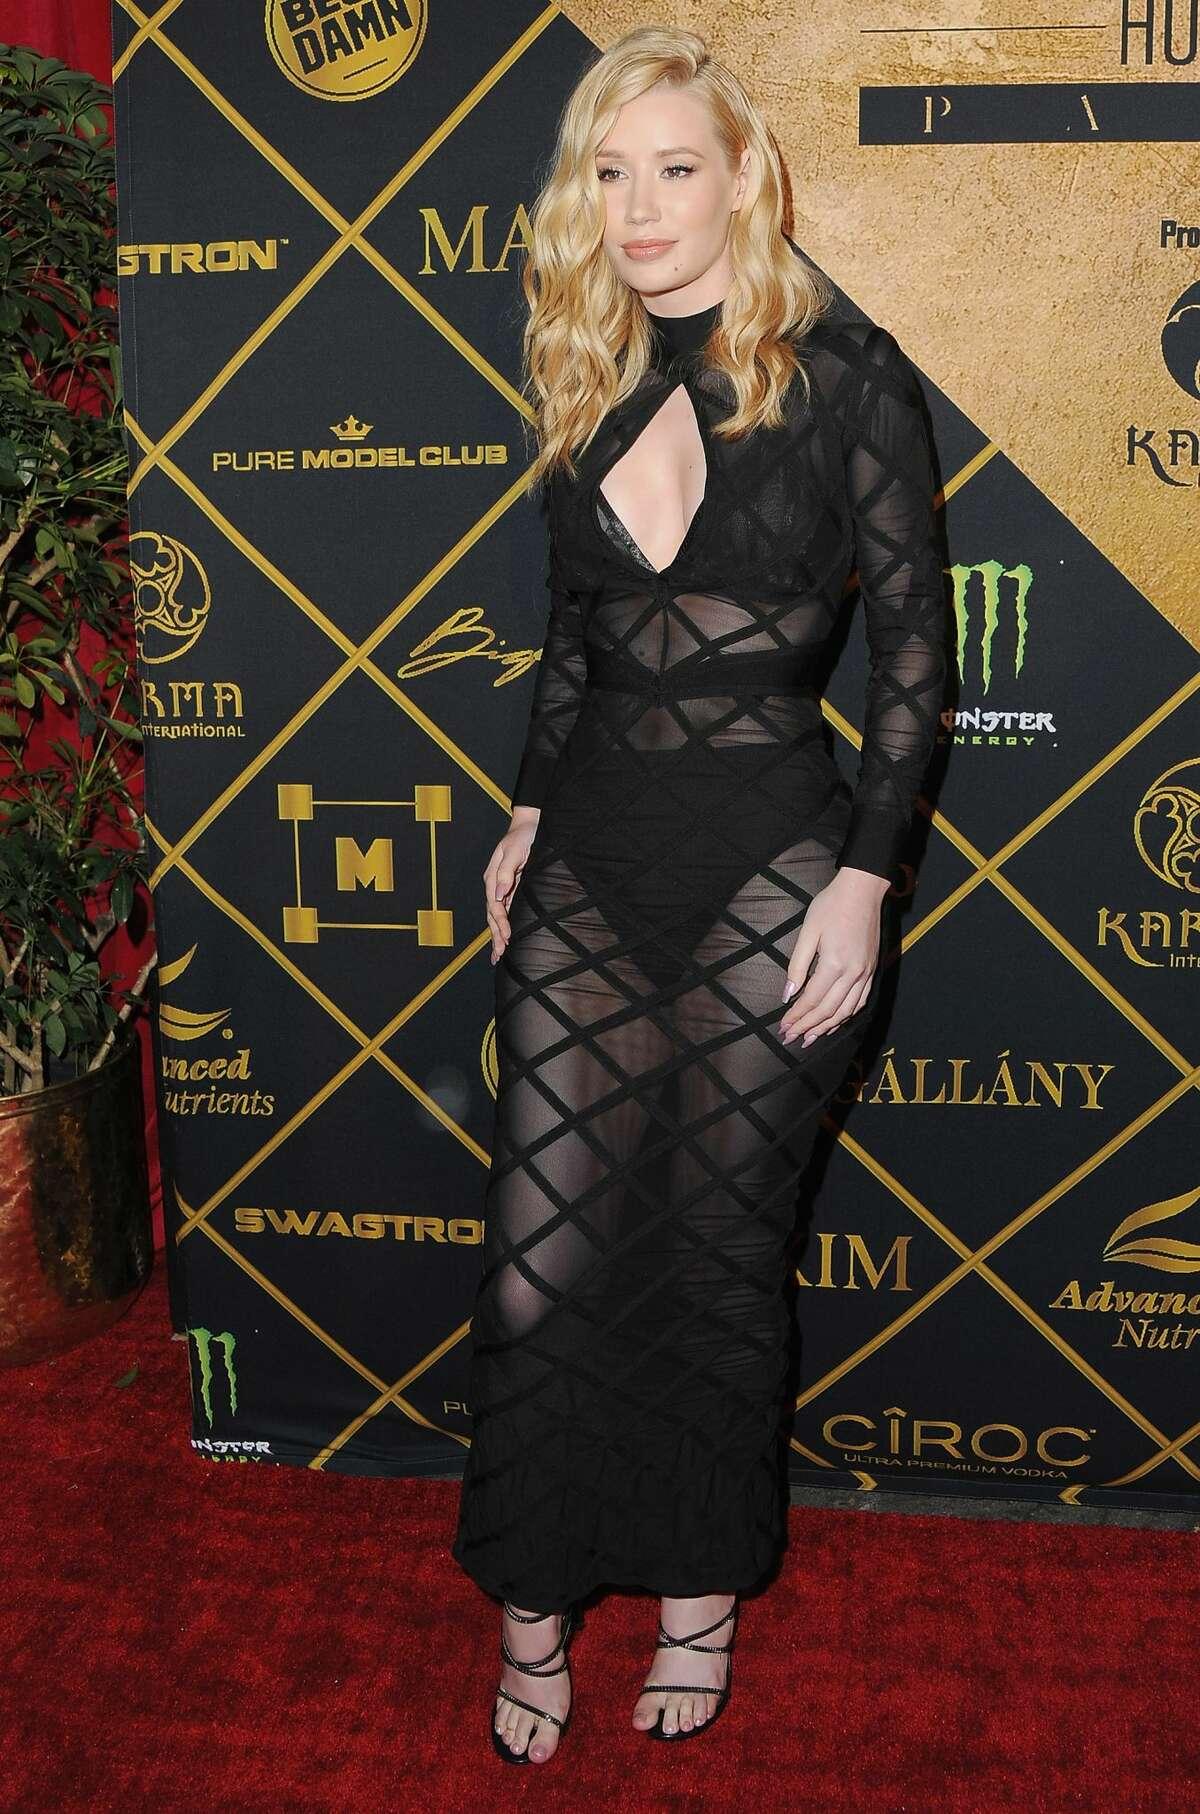 Recording artist Iggy Azalea arrives at the Maxim Hot 100 Party at the Hollywood Palladium on July 30, 2016 in Los Angeles, California. (Photo by Jon Kopaloff/FilmMagic)